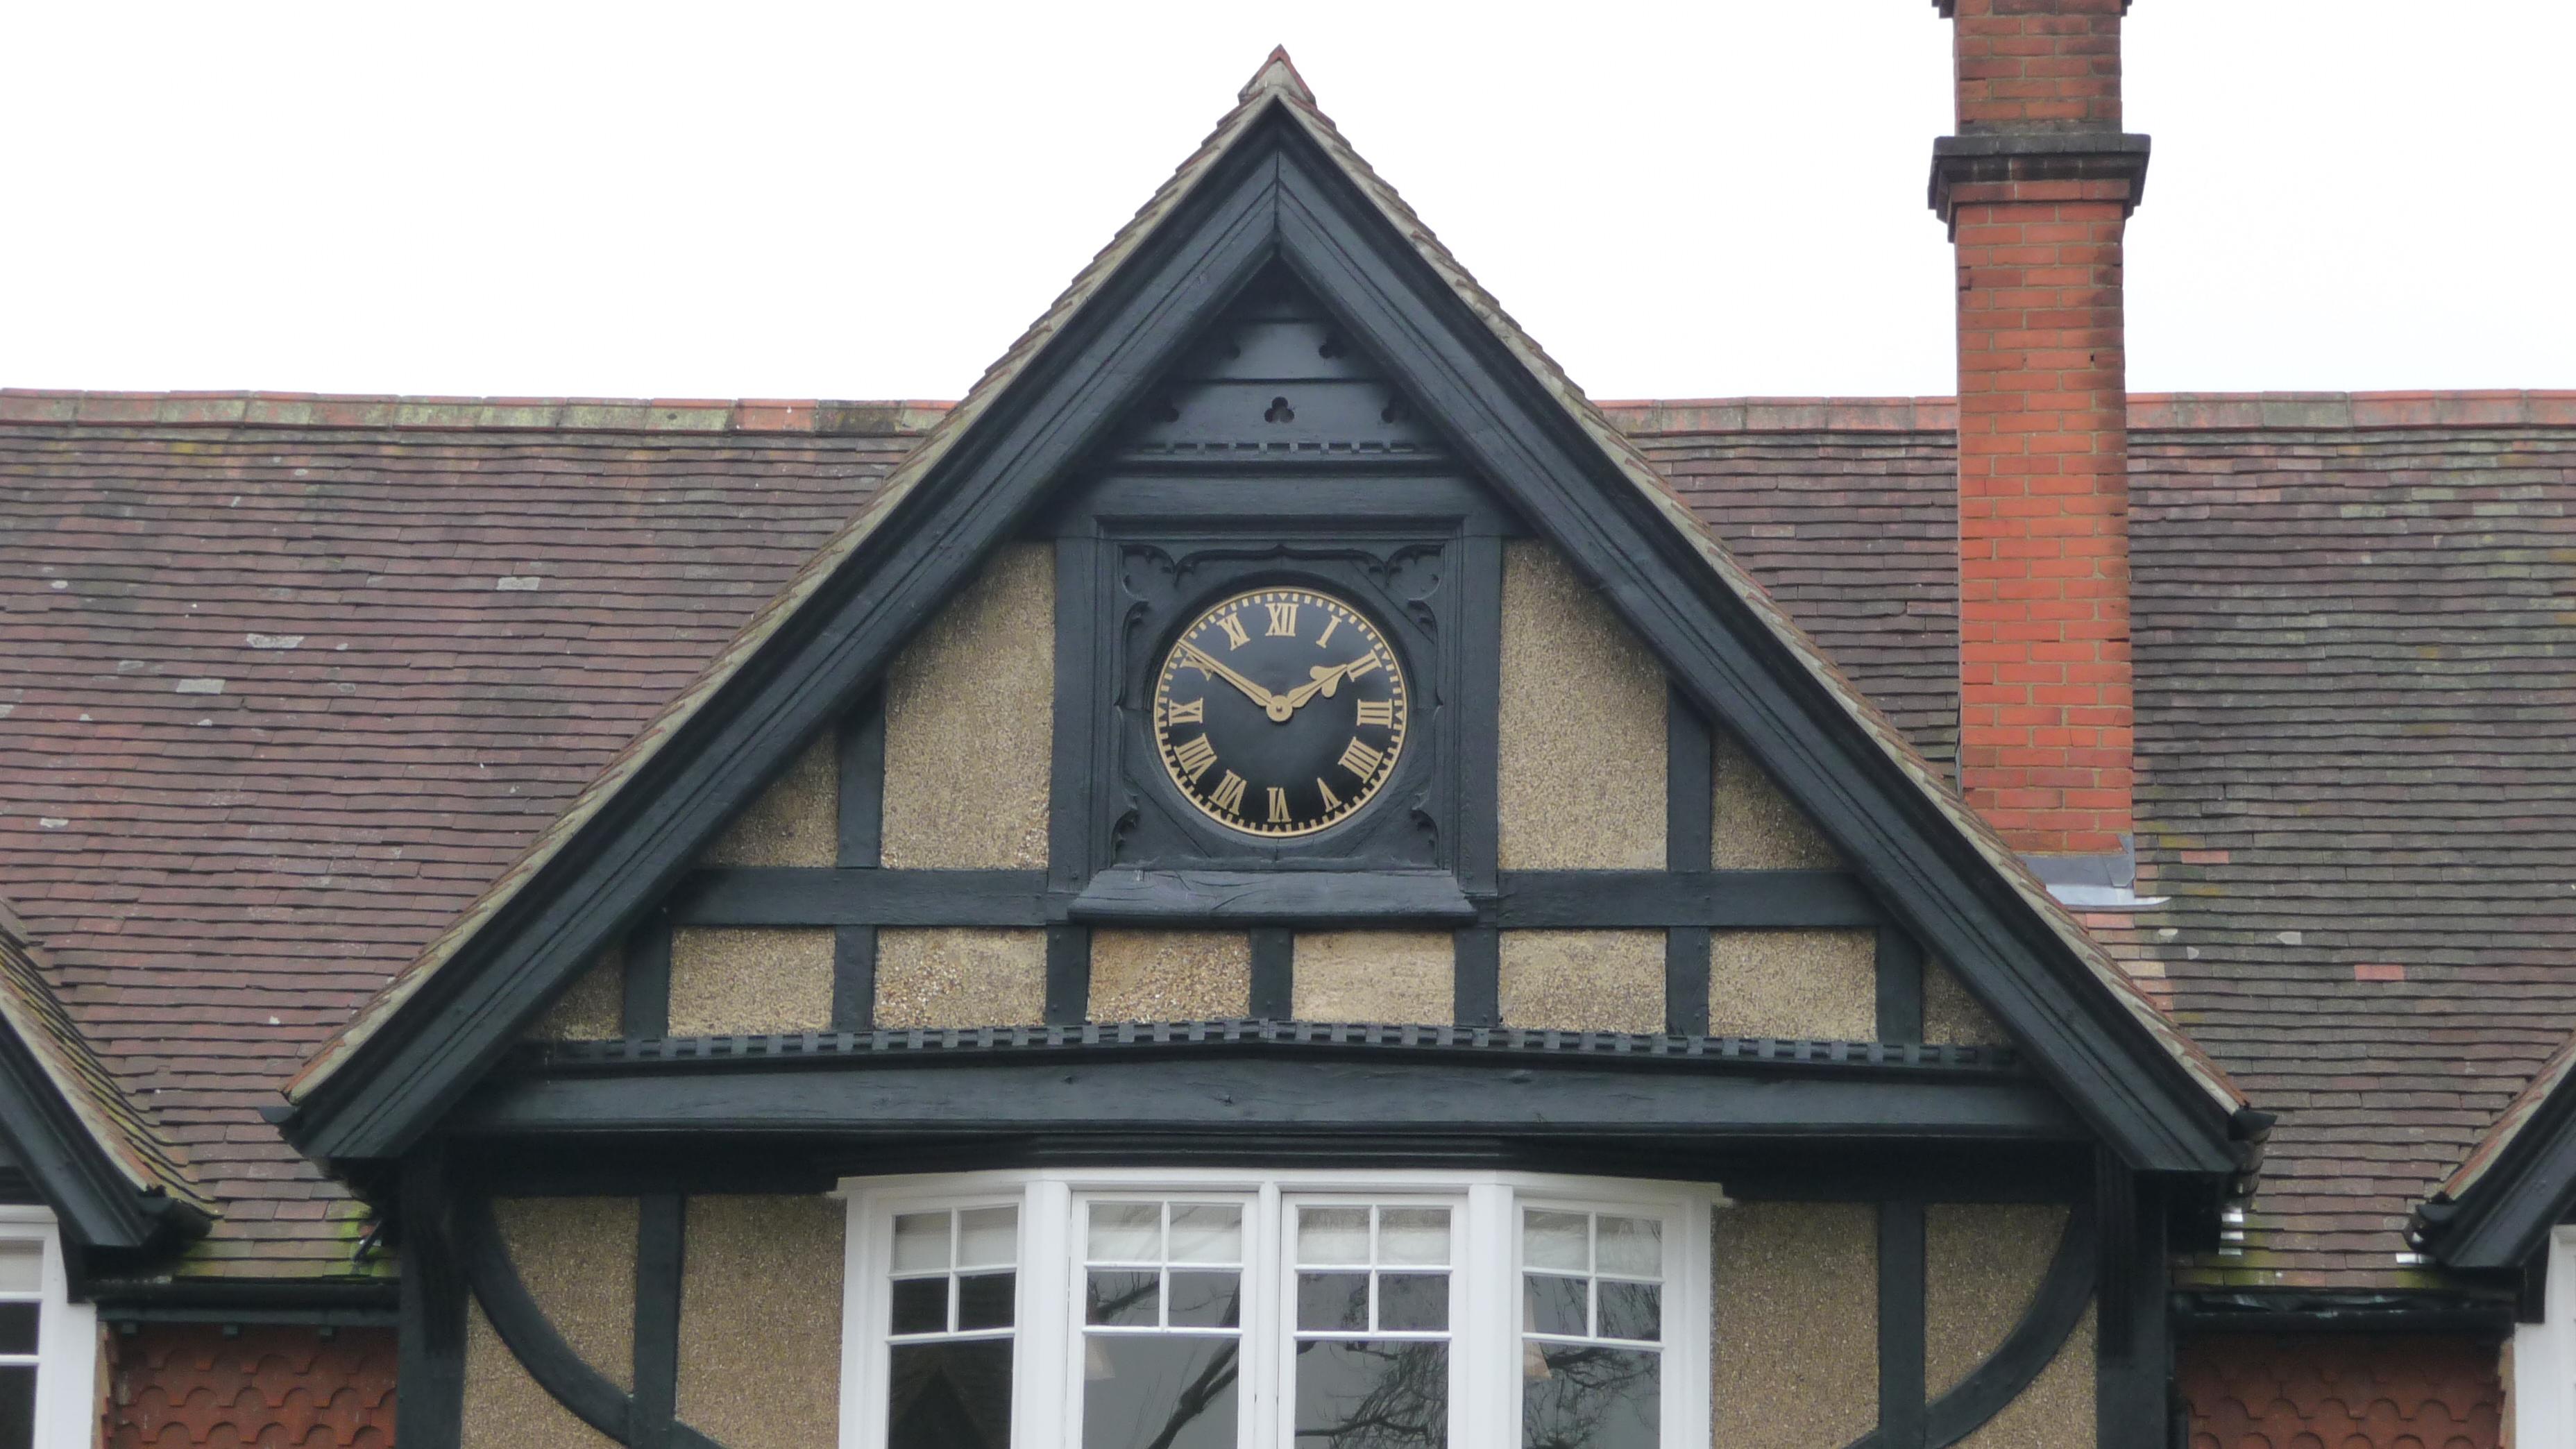 Clock in gable